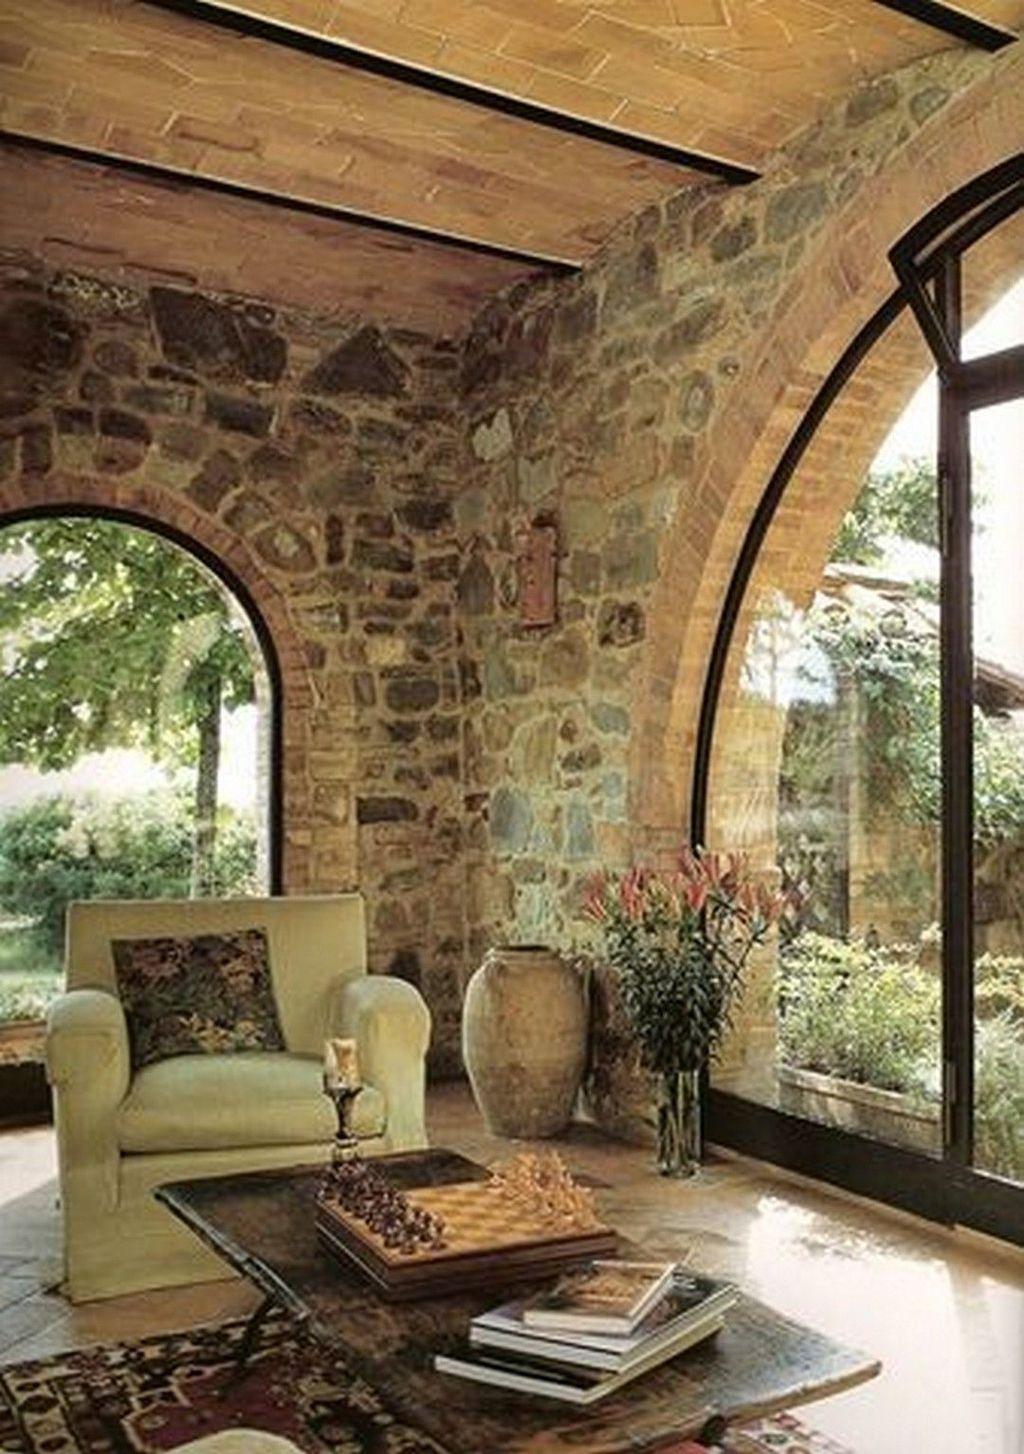 Fabulous Rustic Italian Decor Ideas For Your Home 19